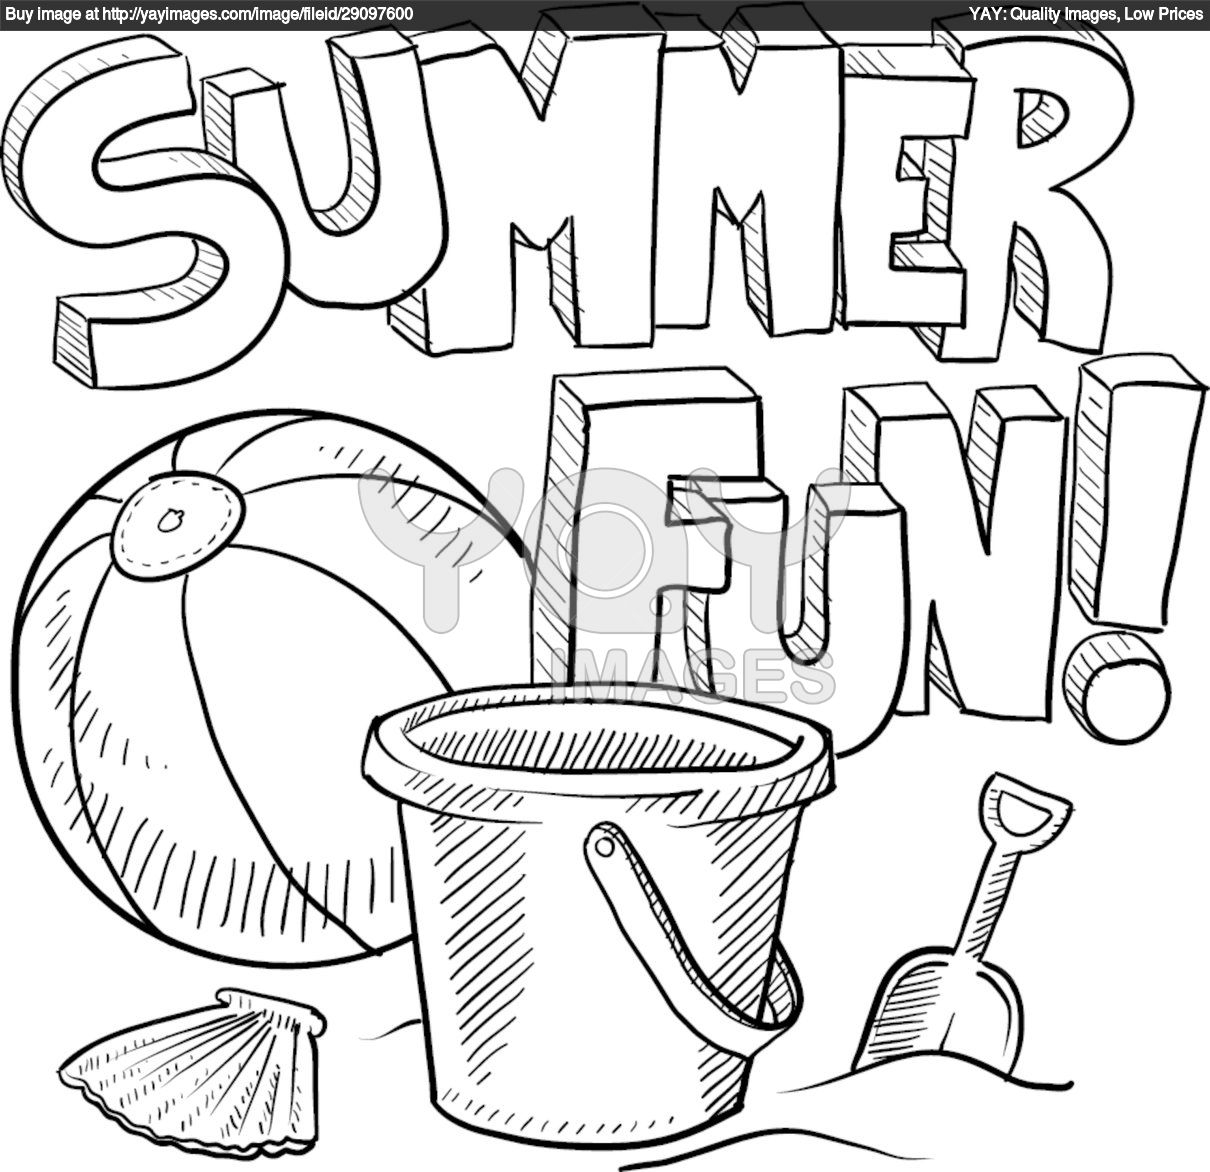 1210x1172 coloring pages beach coloring pages beach holiday scene coloring